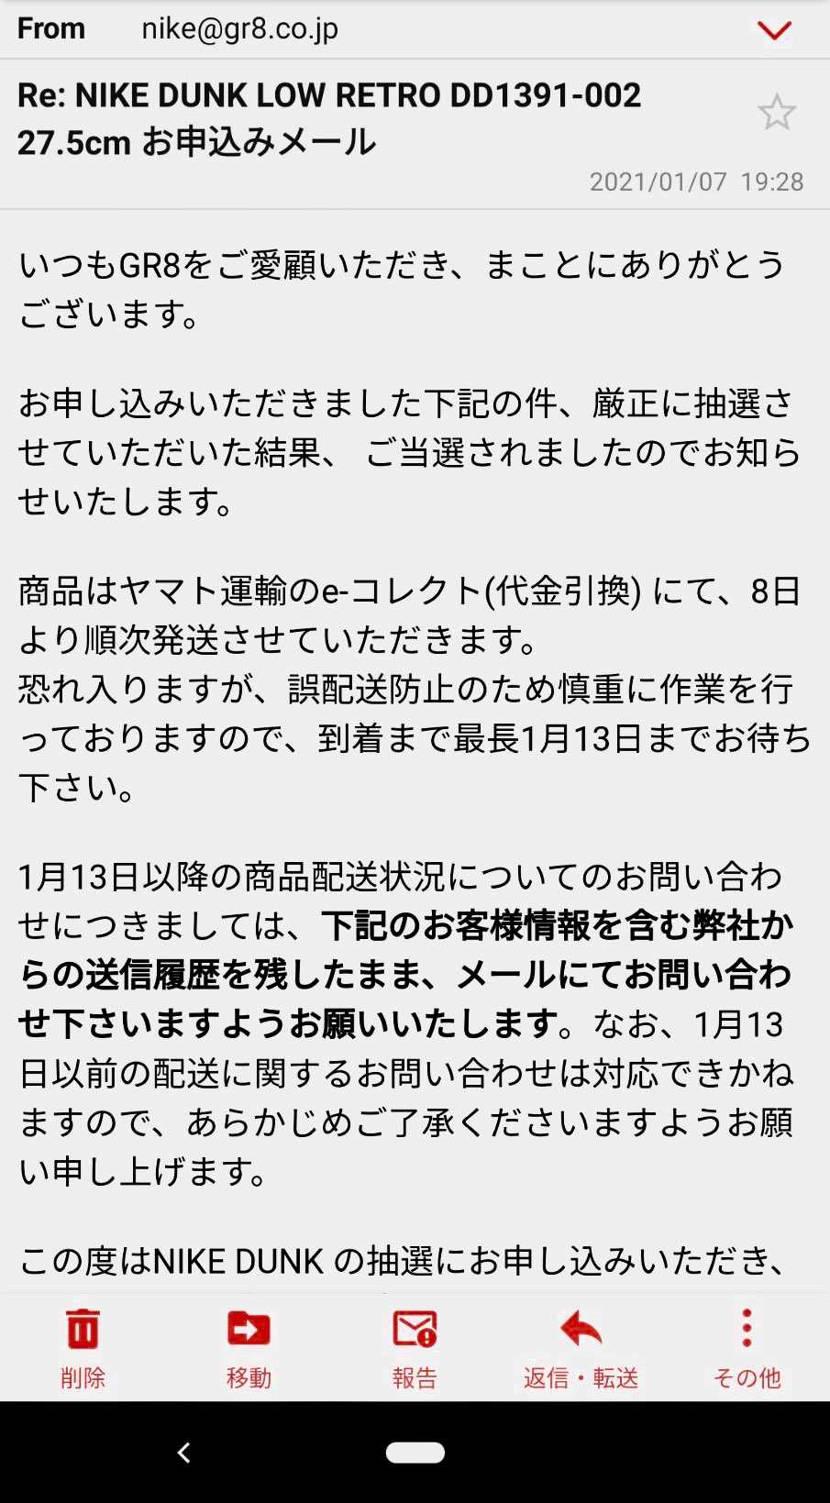 GR8初当選✨DUNK初当選✨ てか、全部外れて諦めてたから嬉しすぎる!!